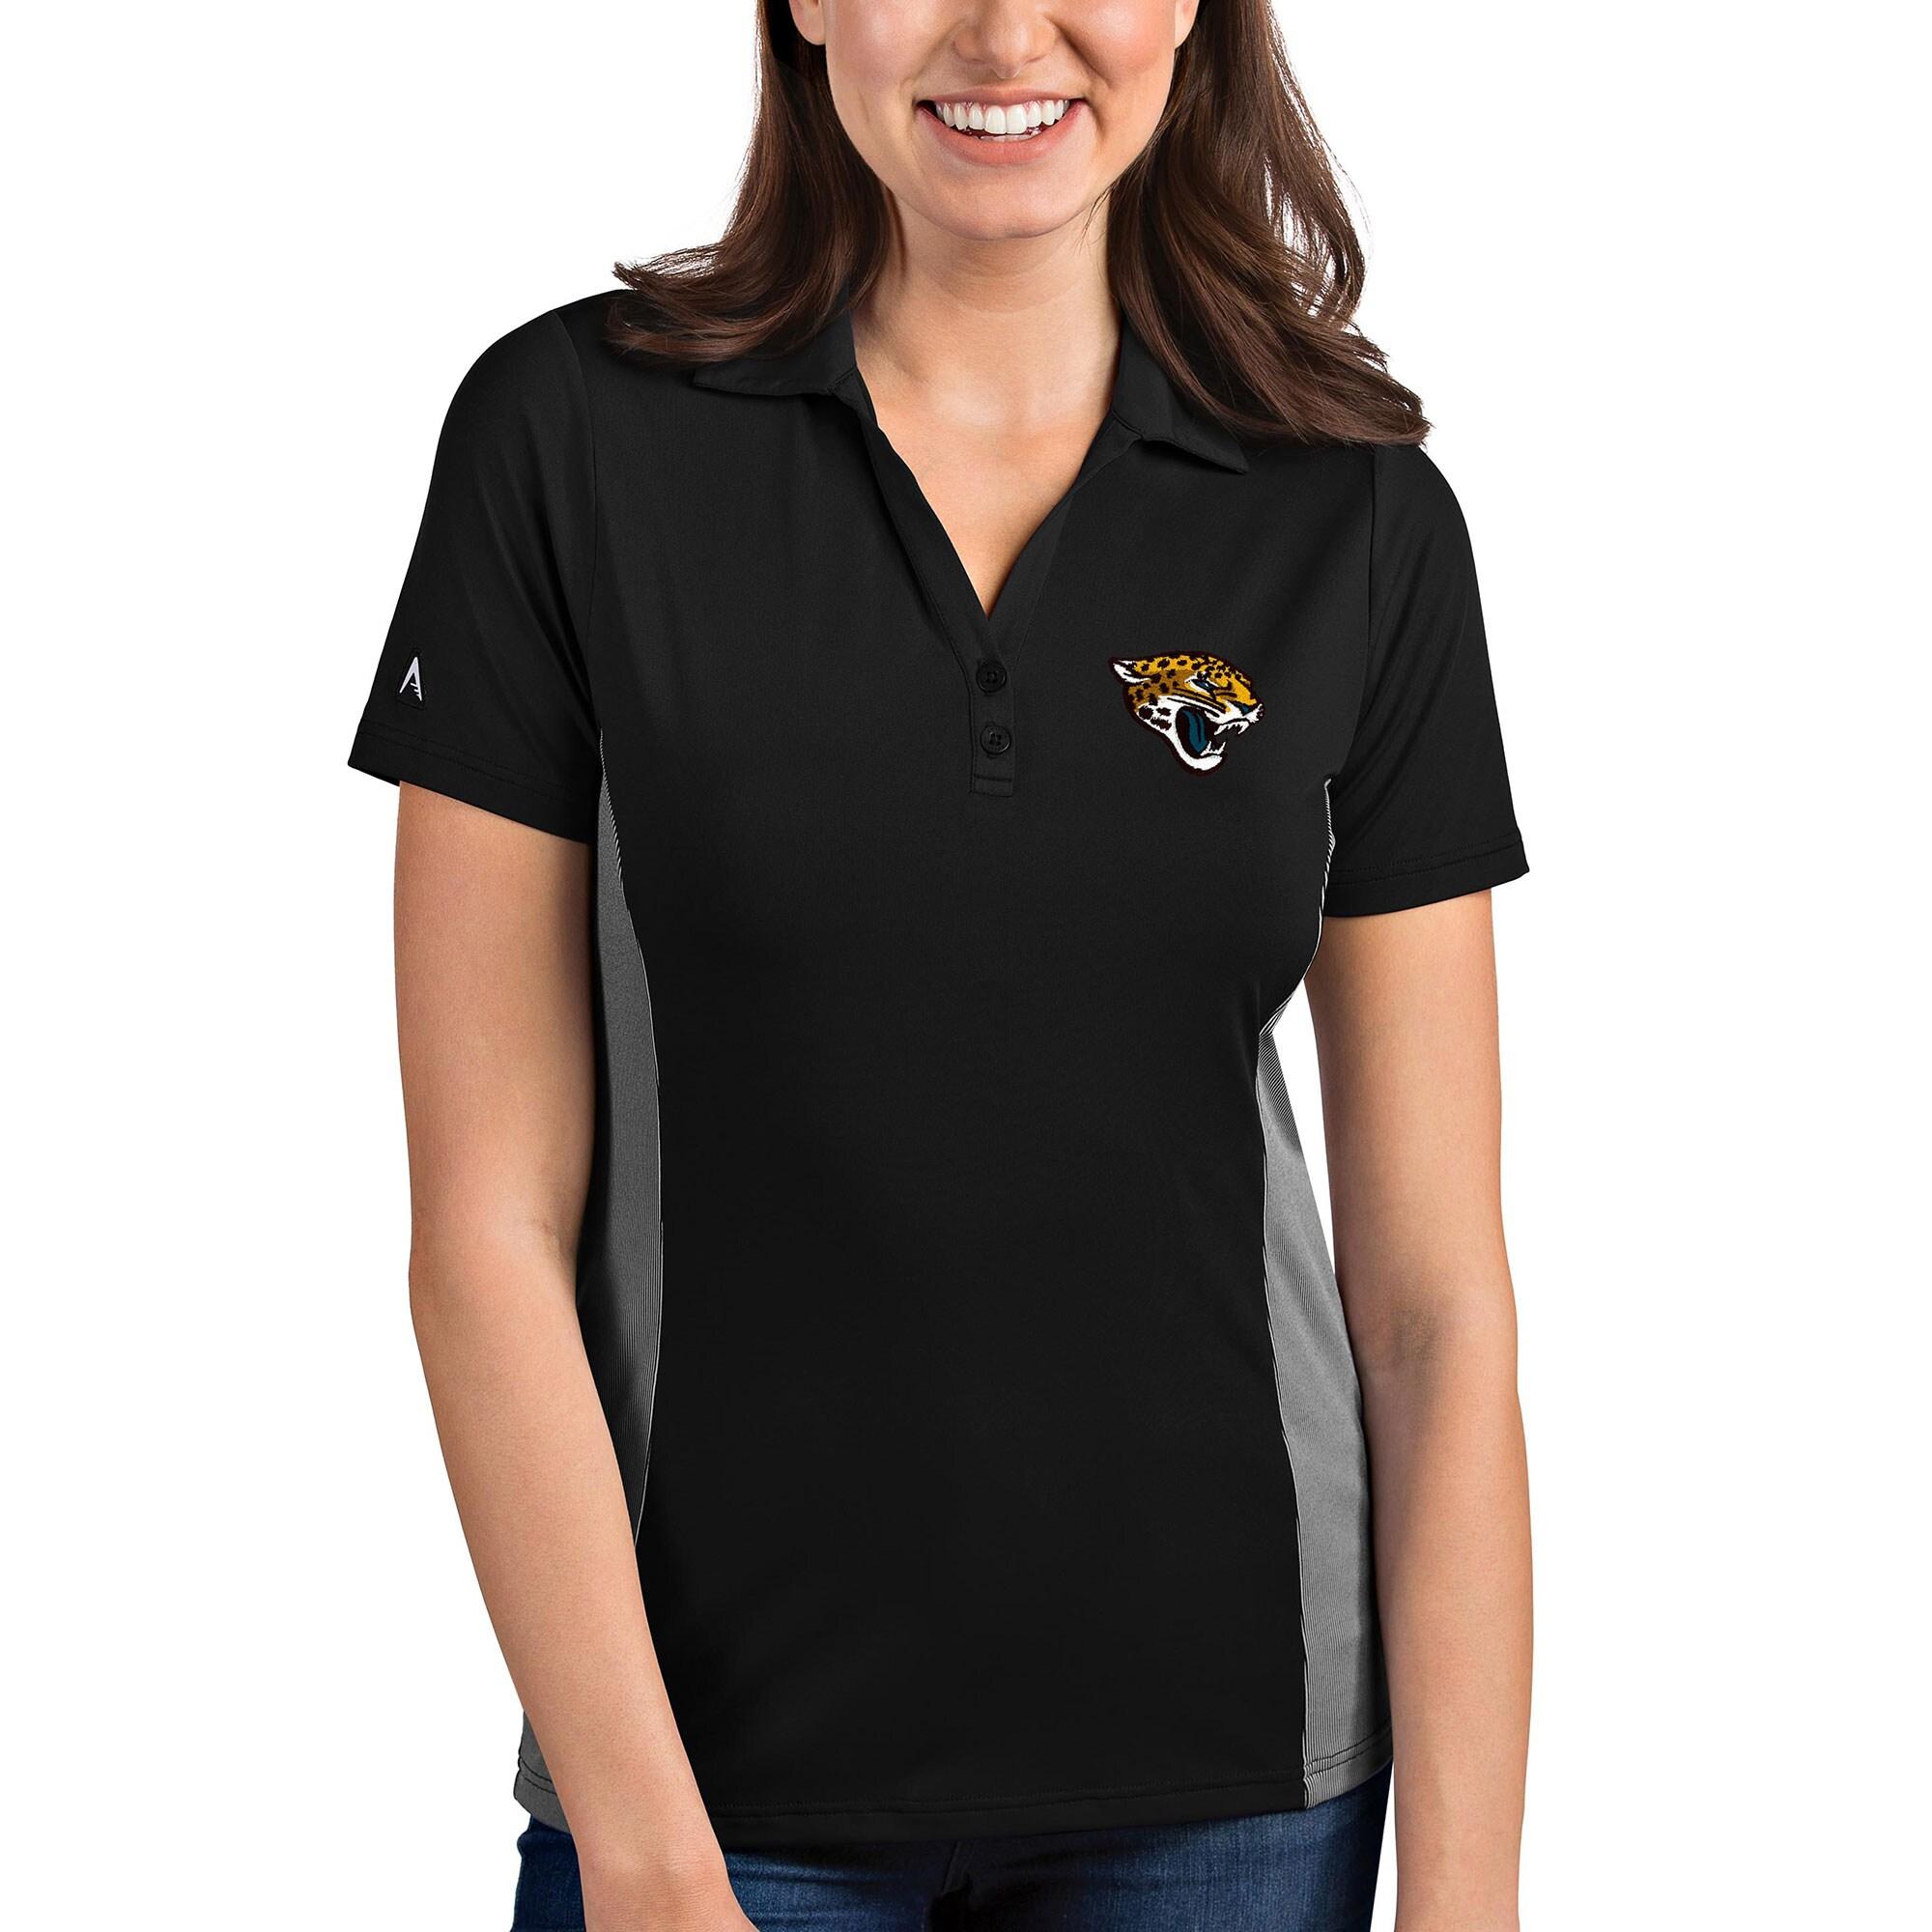 Jacksonville Jaguars Antigua Women's Venture Polo - Black